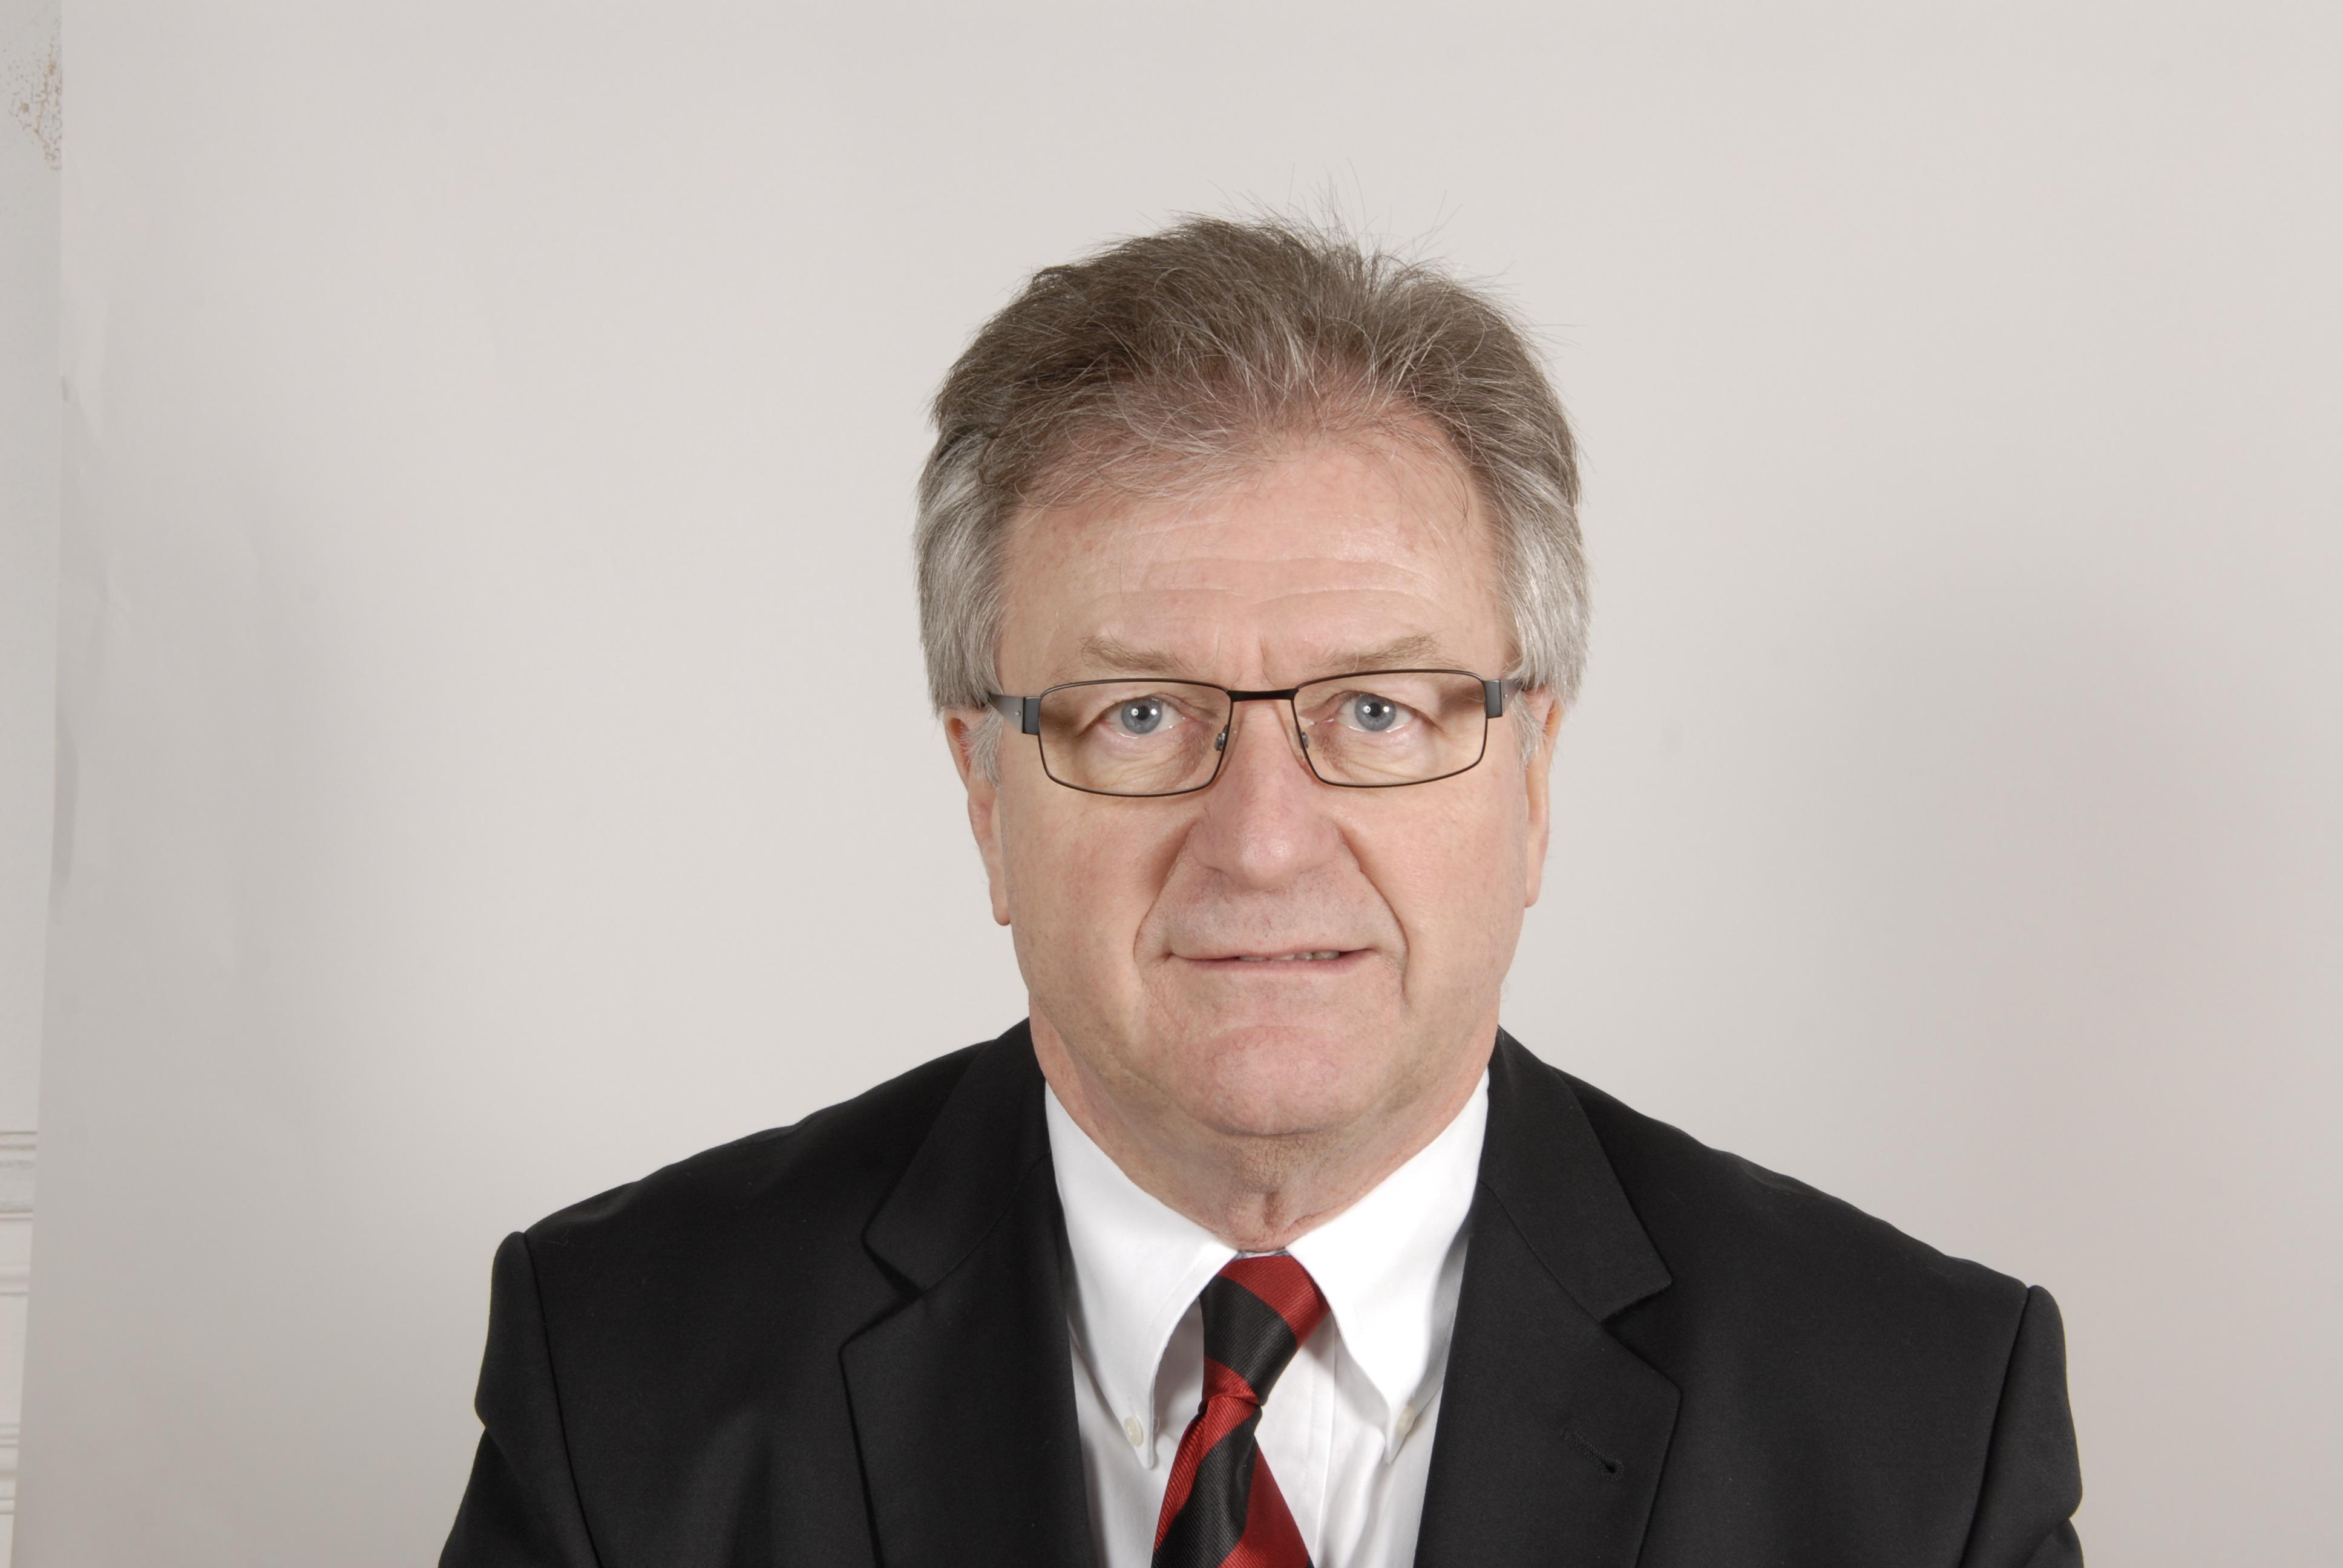 Stéphane Huillet